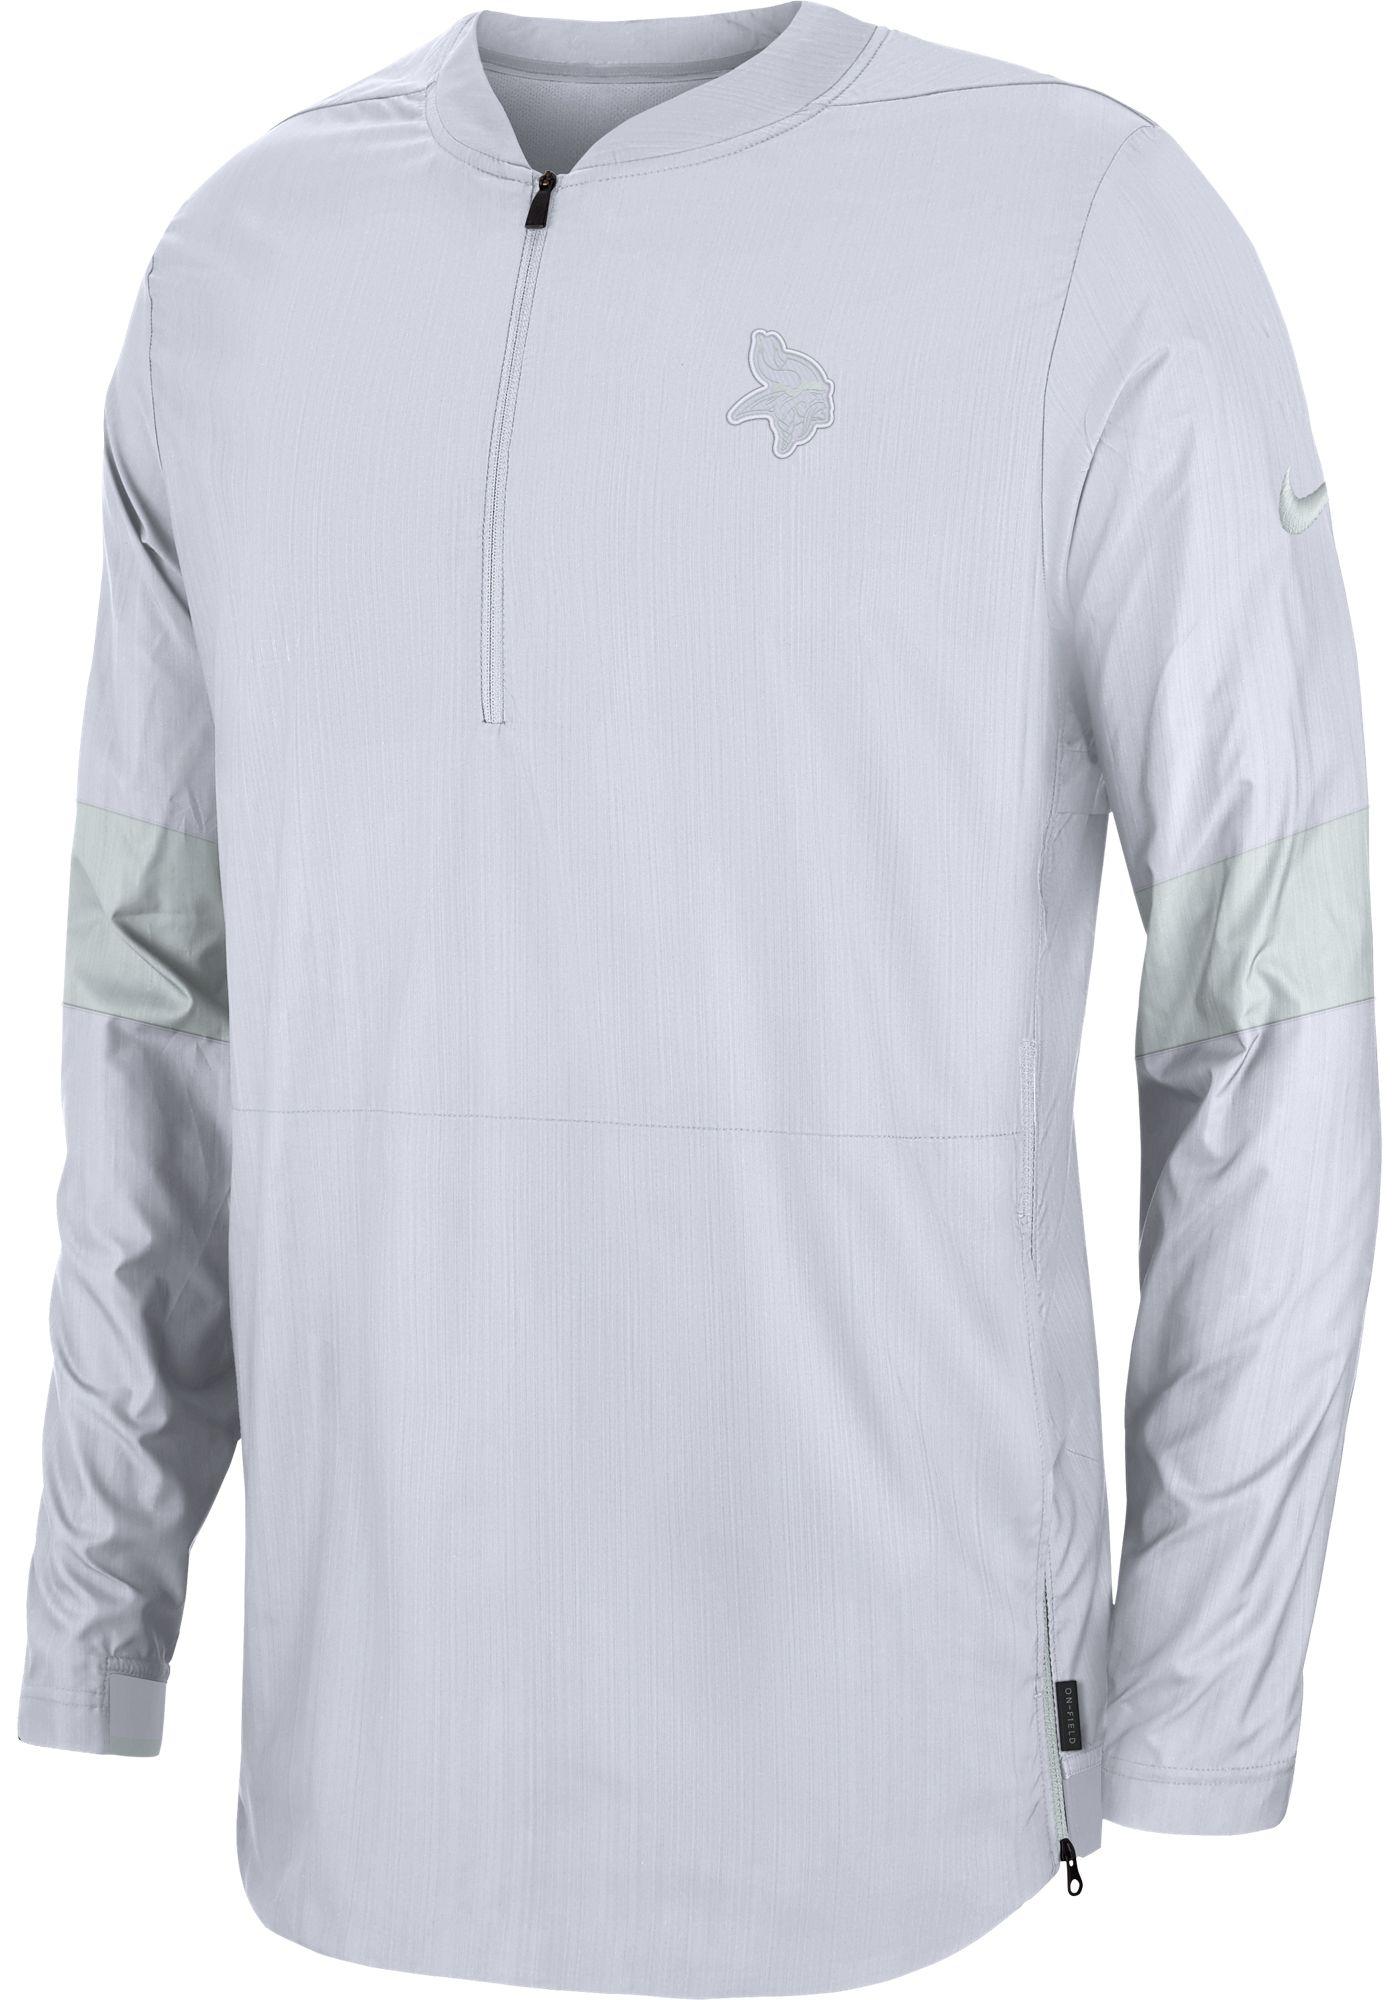 Nike Men's Minnesota Vikings Sideline Coach White Half-Zip Performance Jacket